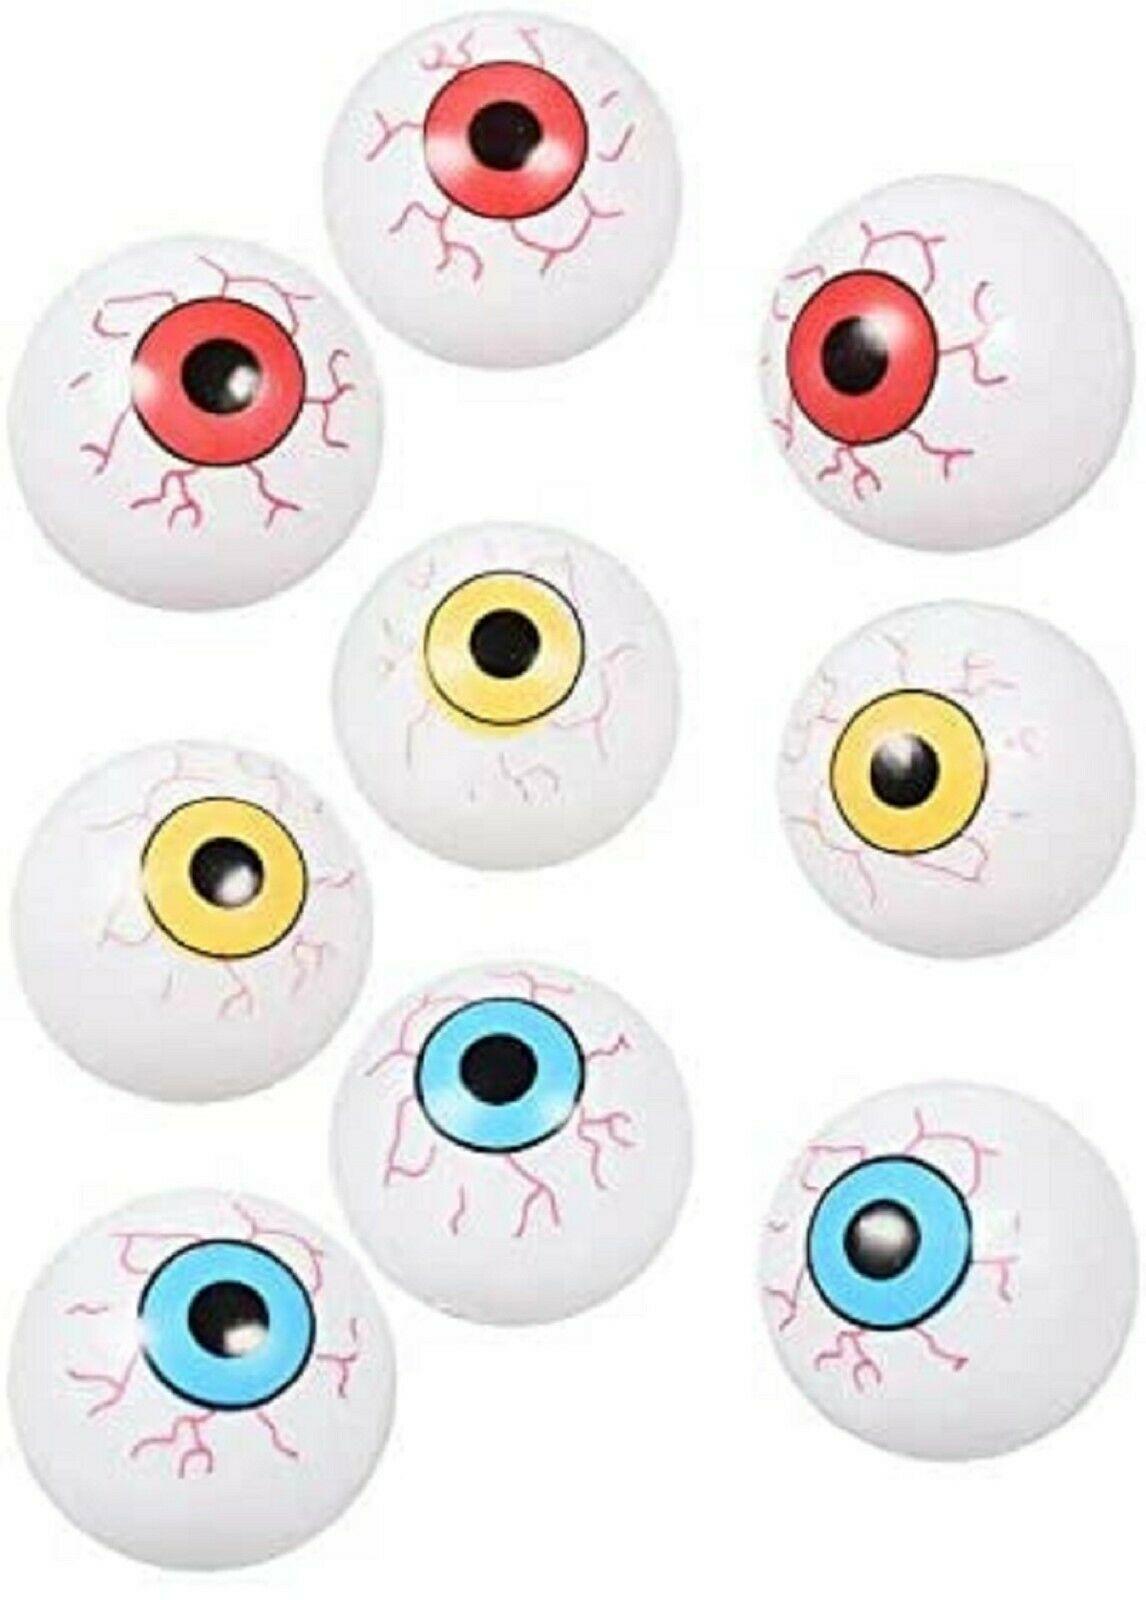 Eyeball Ping Pong Balls for Halloween or Table Tennis - 12 Plastic EyeBalls